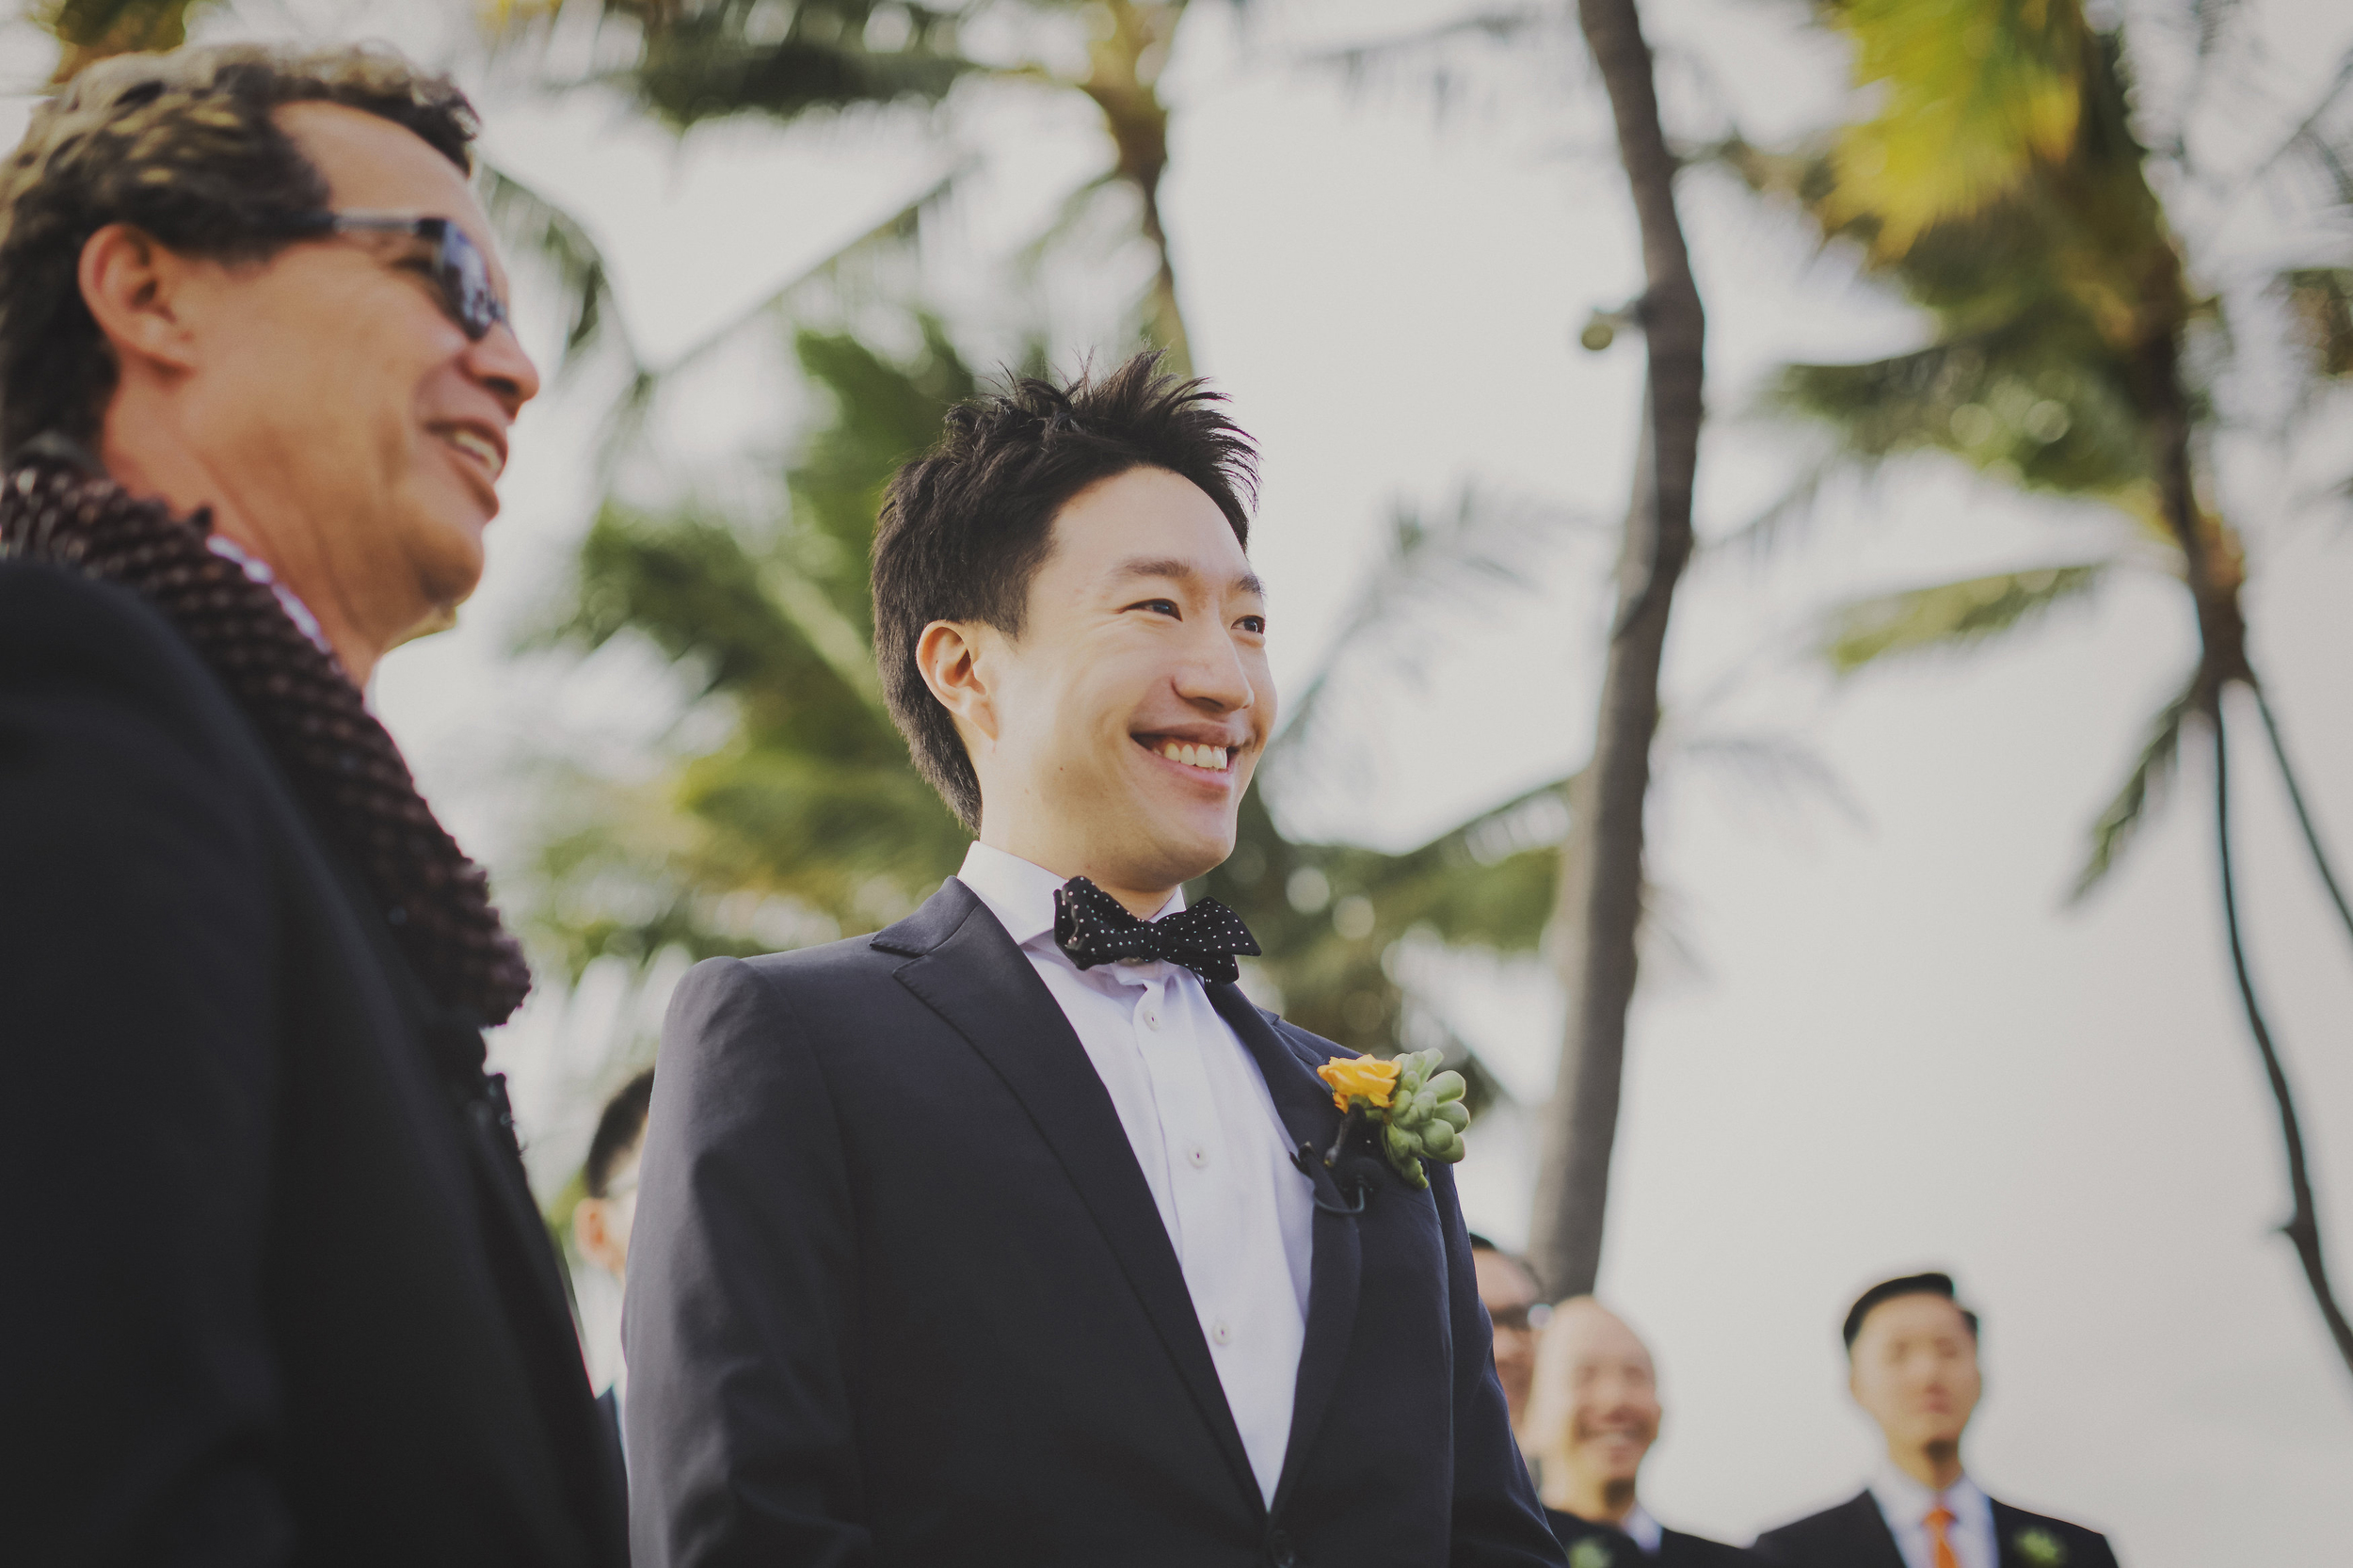 angie-diaz-photography-oahu-wedding-lanikuhonoa-shenshen-marshall-27.jpg